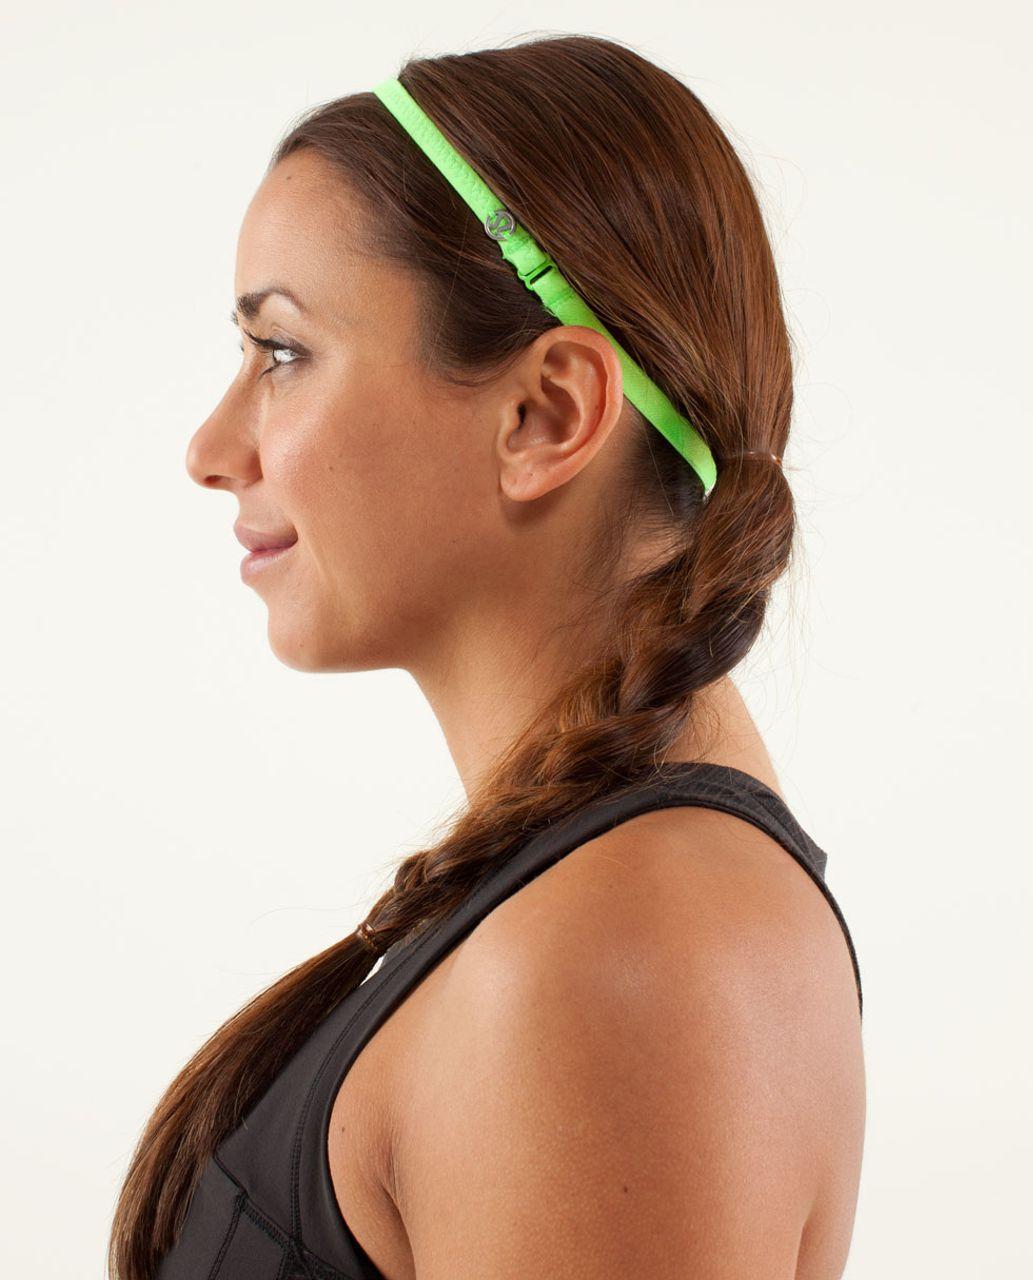 Lululemon Strappy Headband - Zippy Green